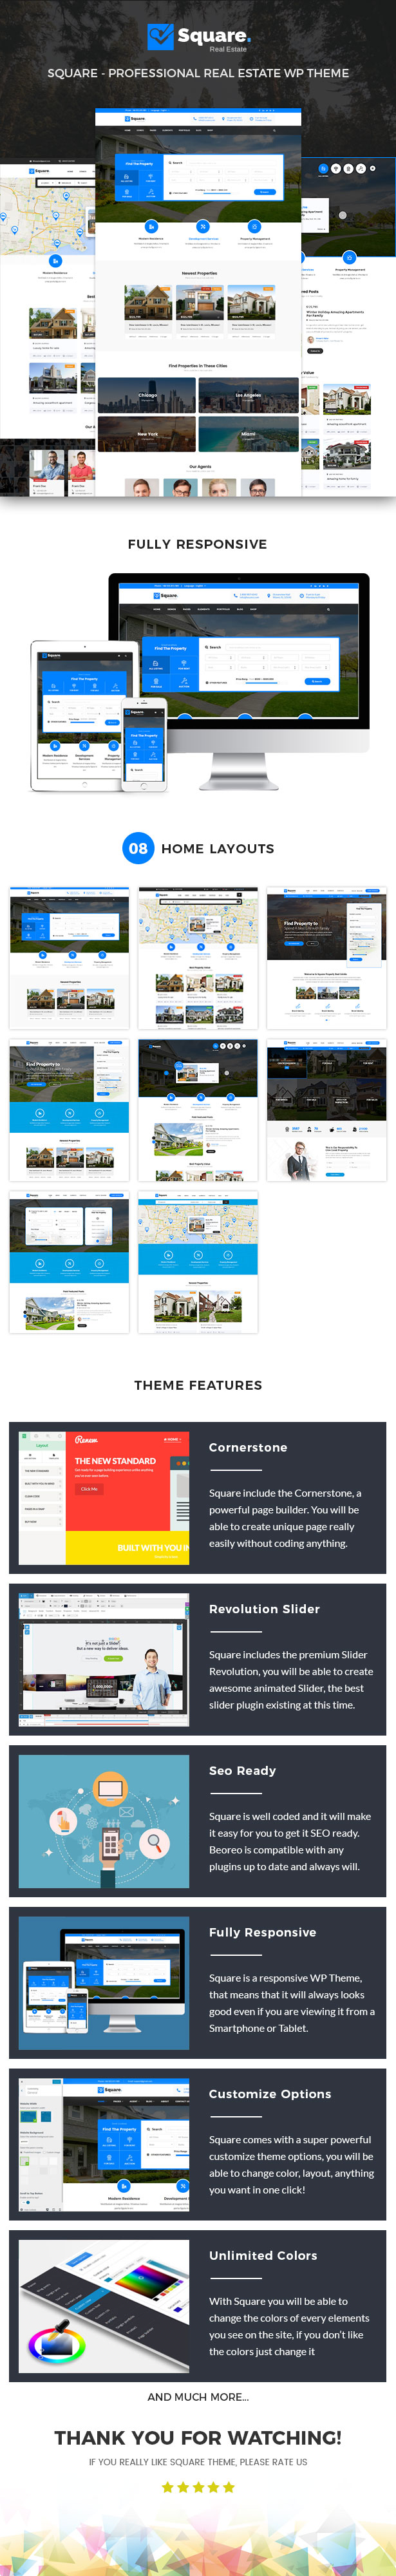 Square - Real Estate WordPress Theme - 1